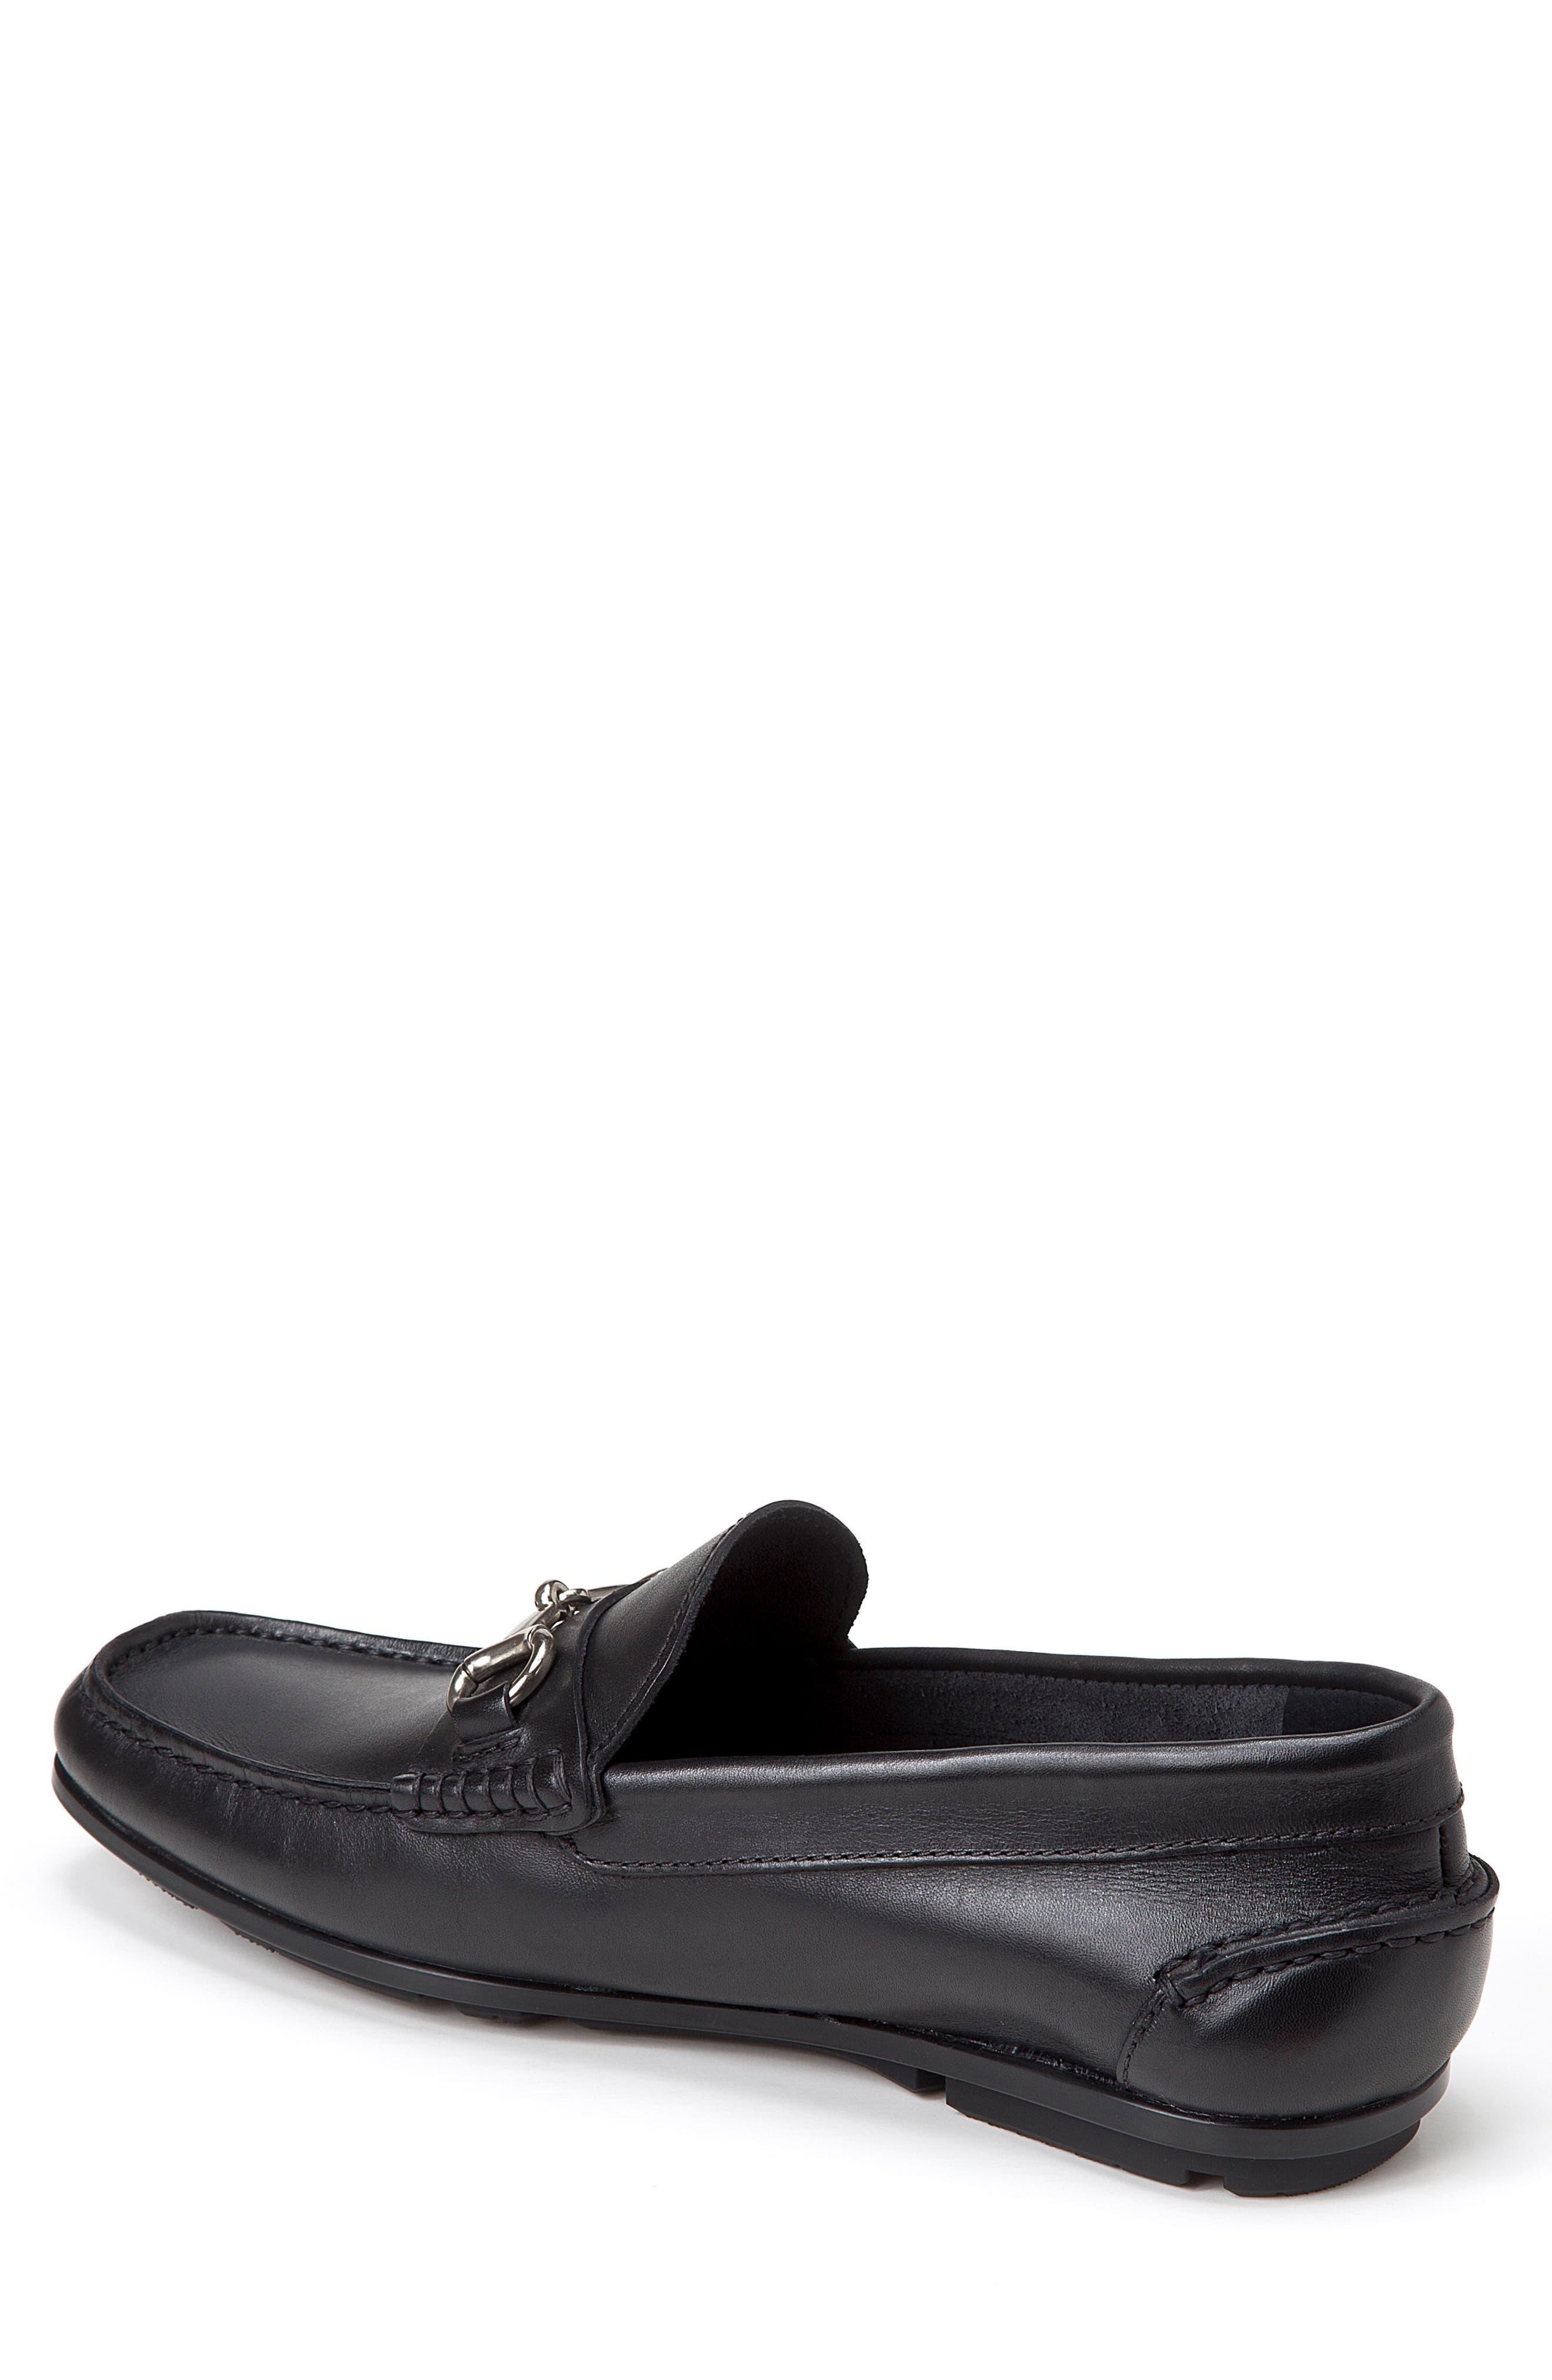 Marco Moc Toe Loafer,                             Alternate thumbnail 2, color,                             Black Leather